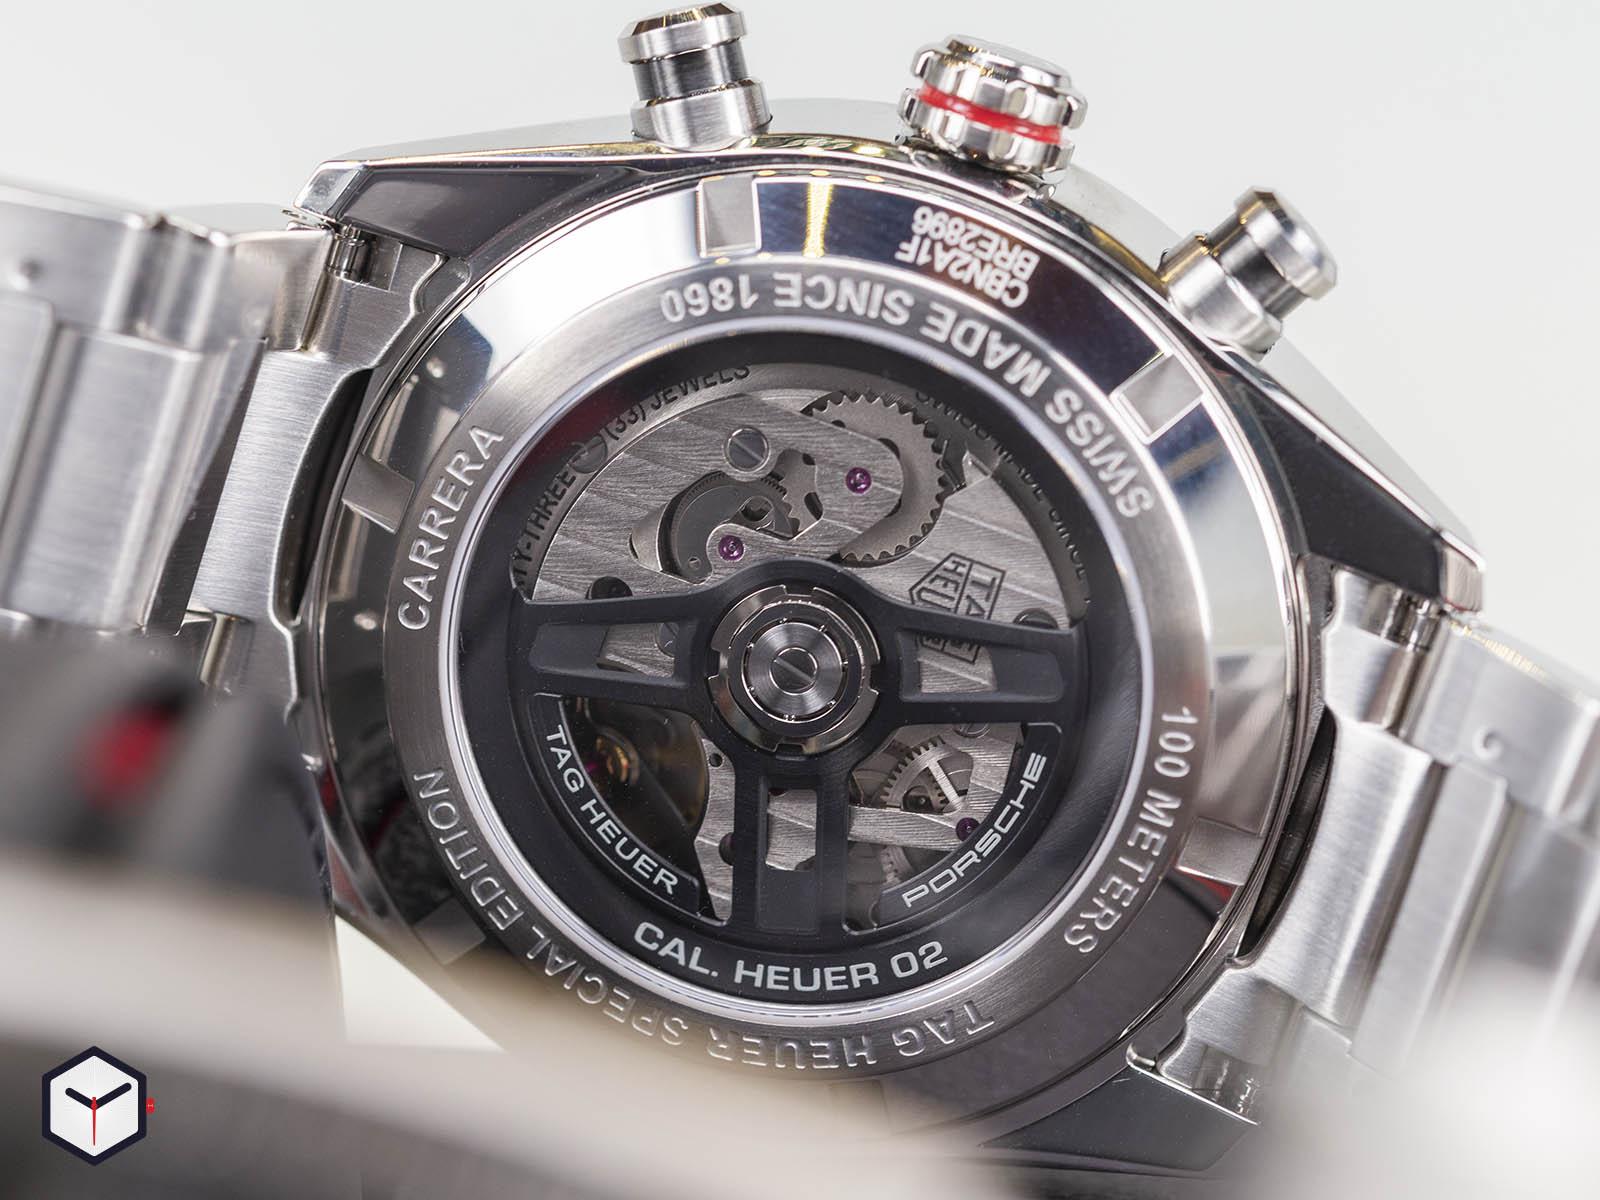 cbn2a1f-ba0643-tag-heuer-carrera-porsche-chronograph-1-6.jpg